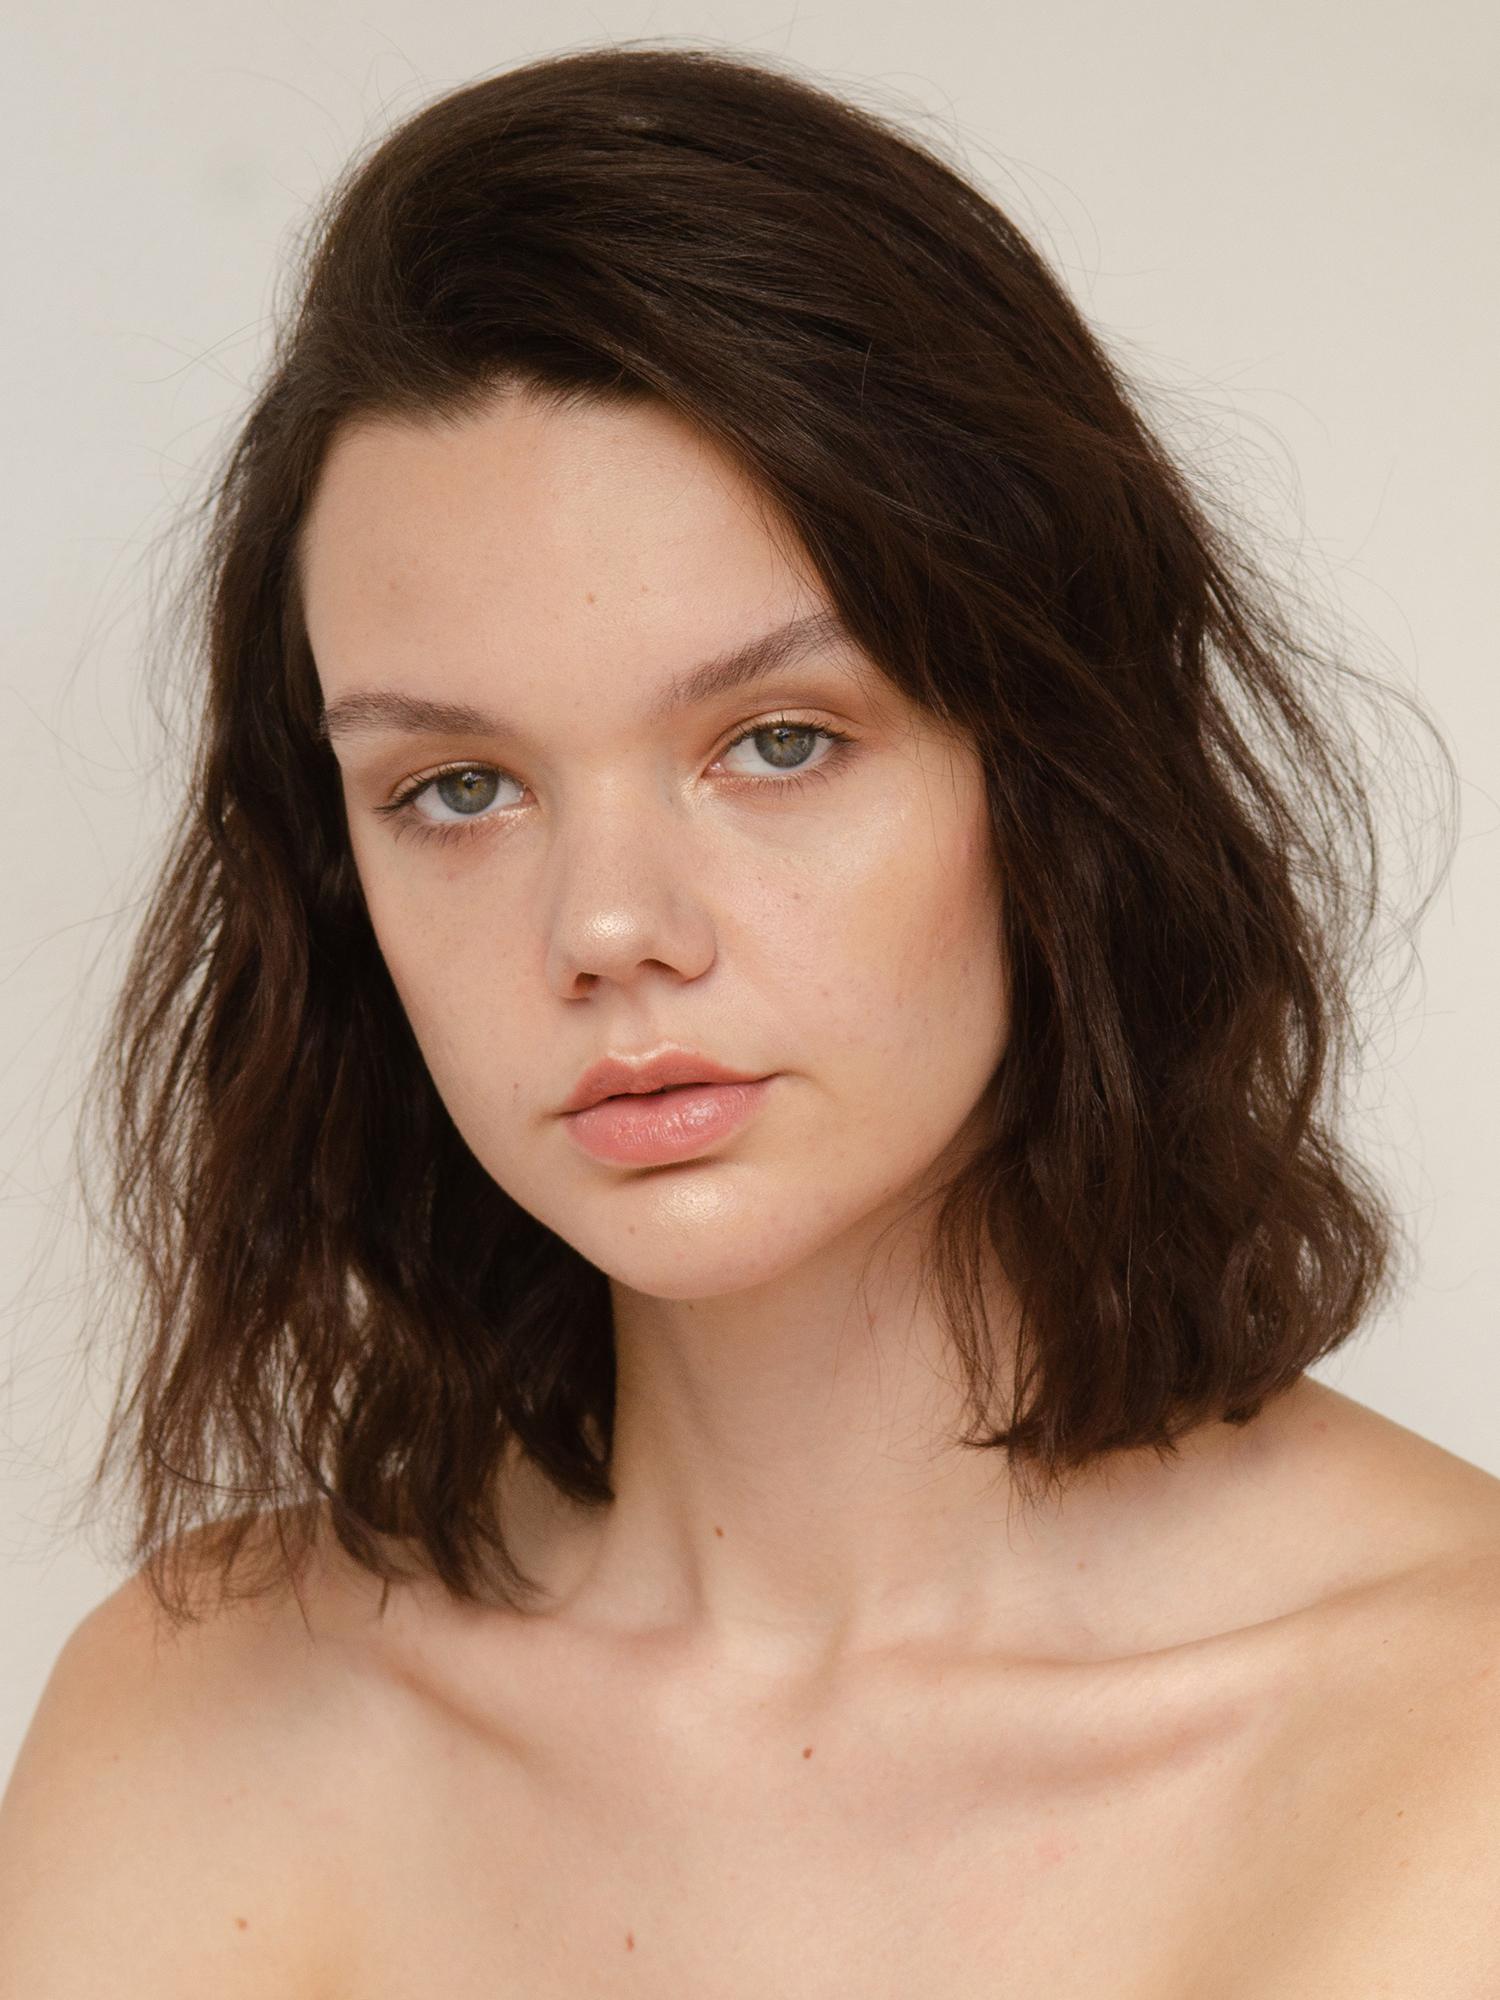 NEUE model Kaela Bayliss shot by Aaron VIII. Beauty by Mivia Pinniger using Fenty